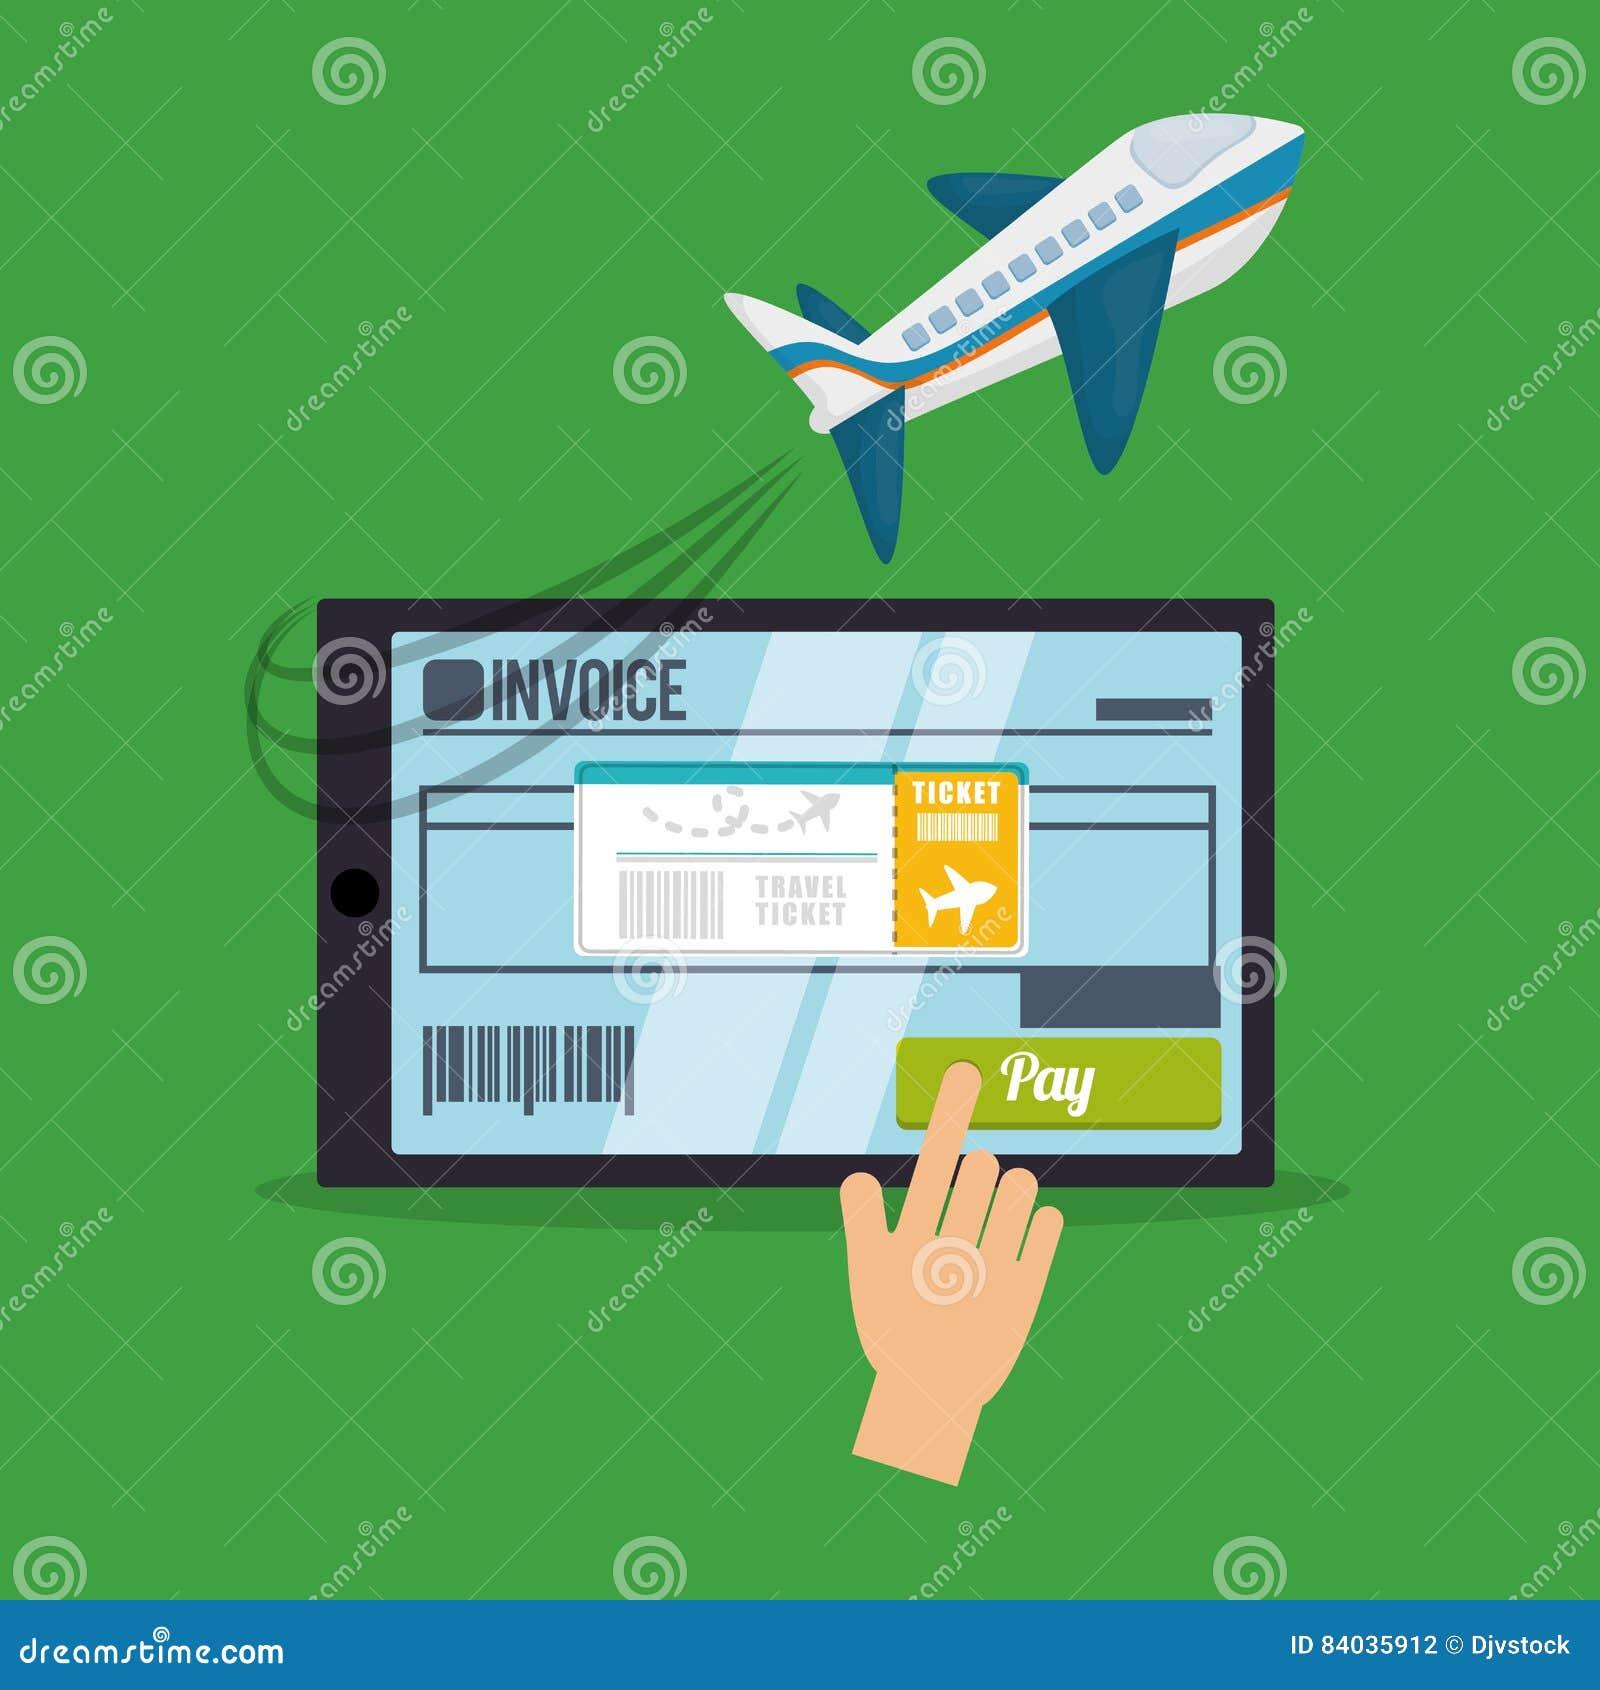 Buy Travel Tickets Online: Travel Smartphone Ticket Invoice Airplane Buy Stock